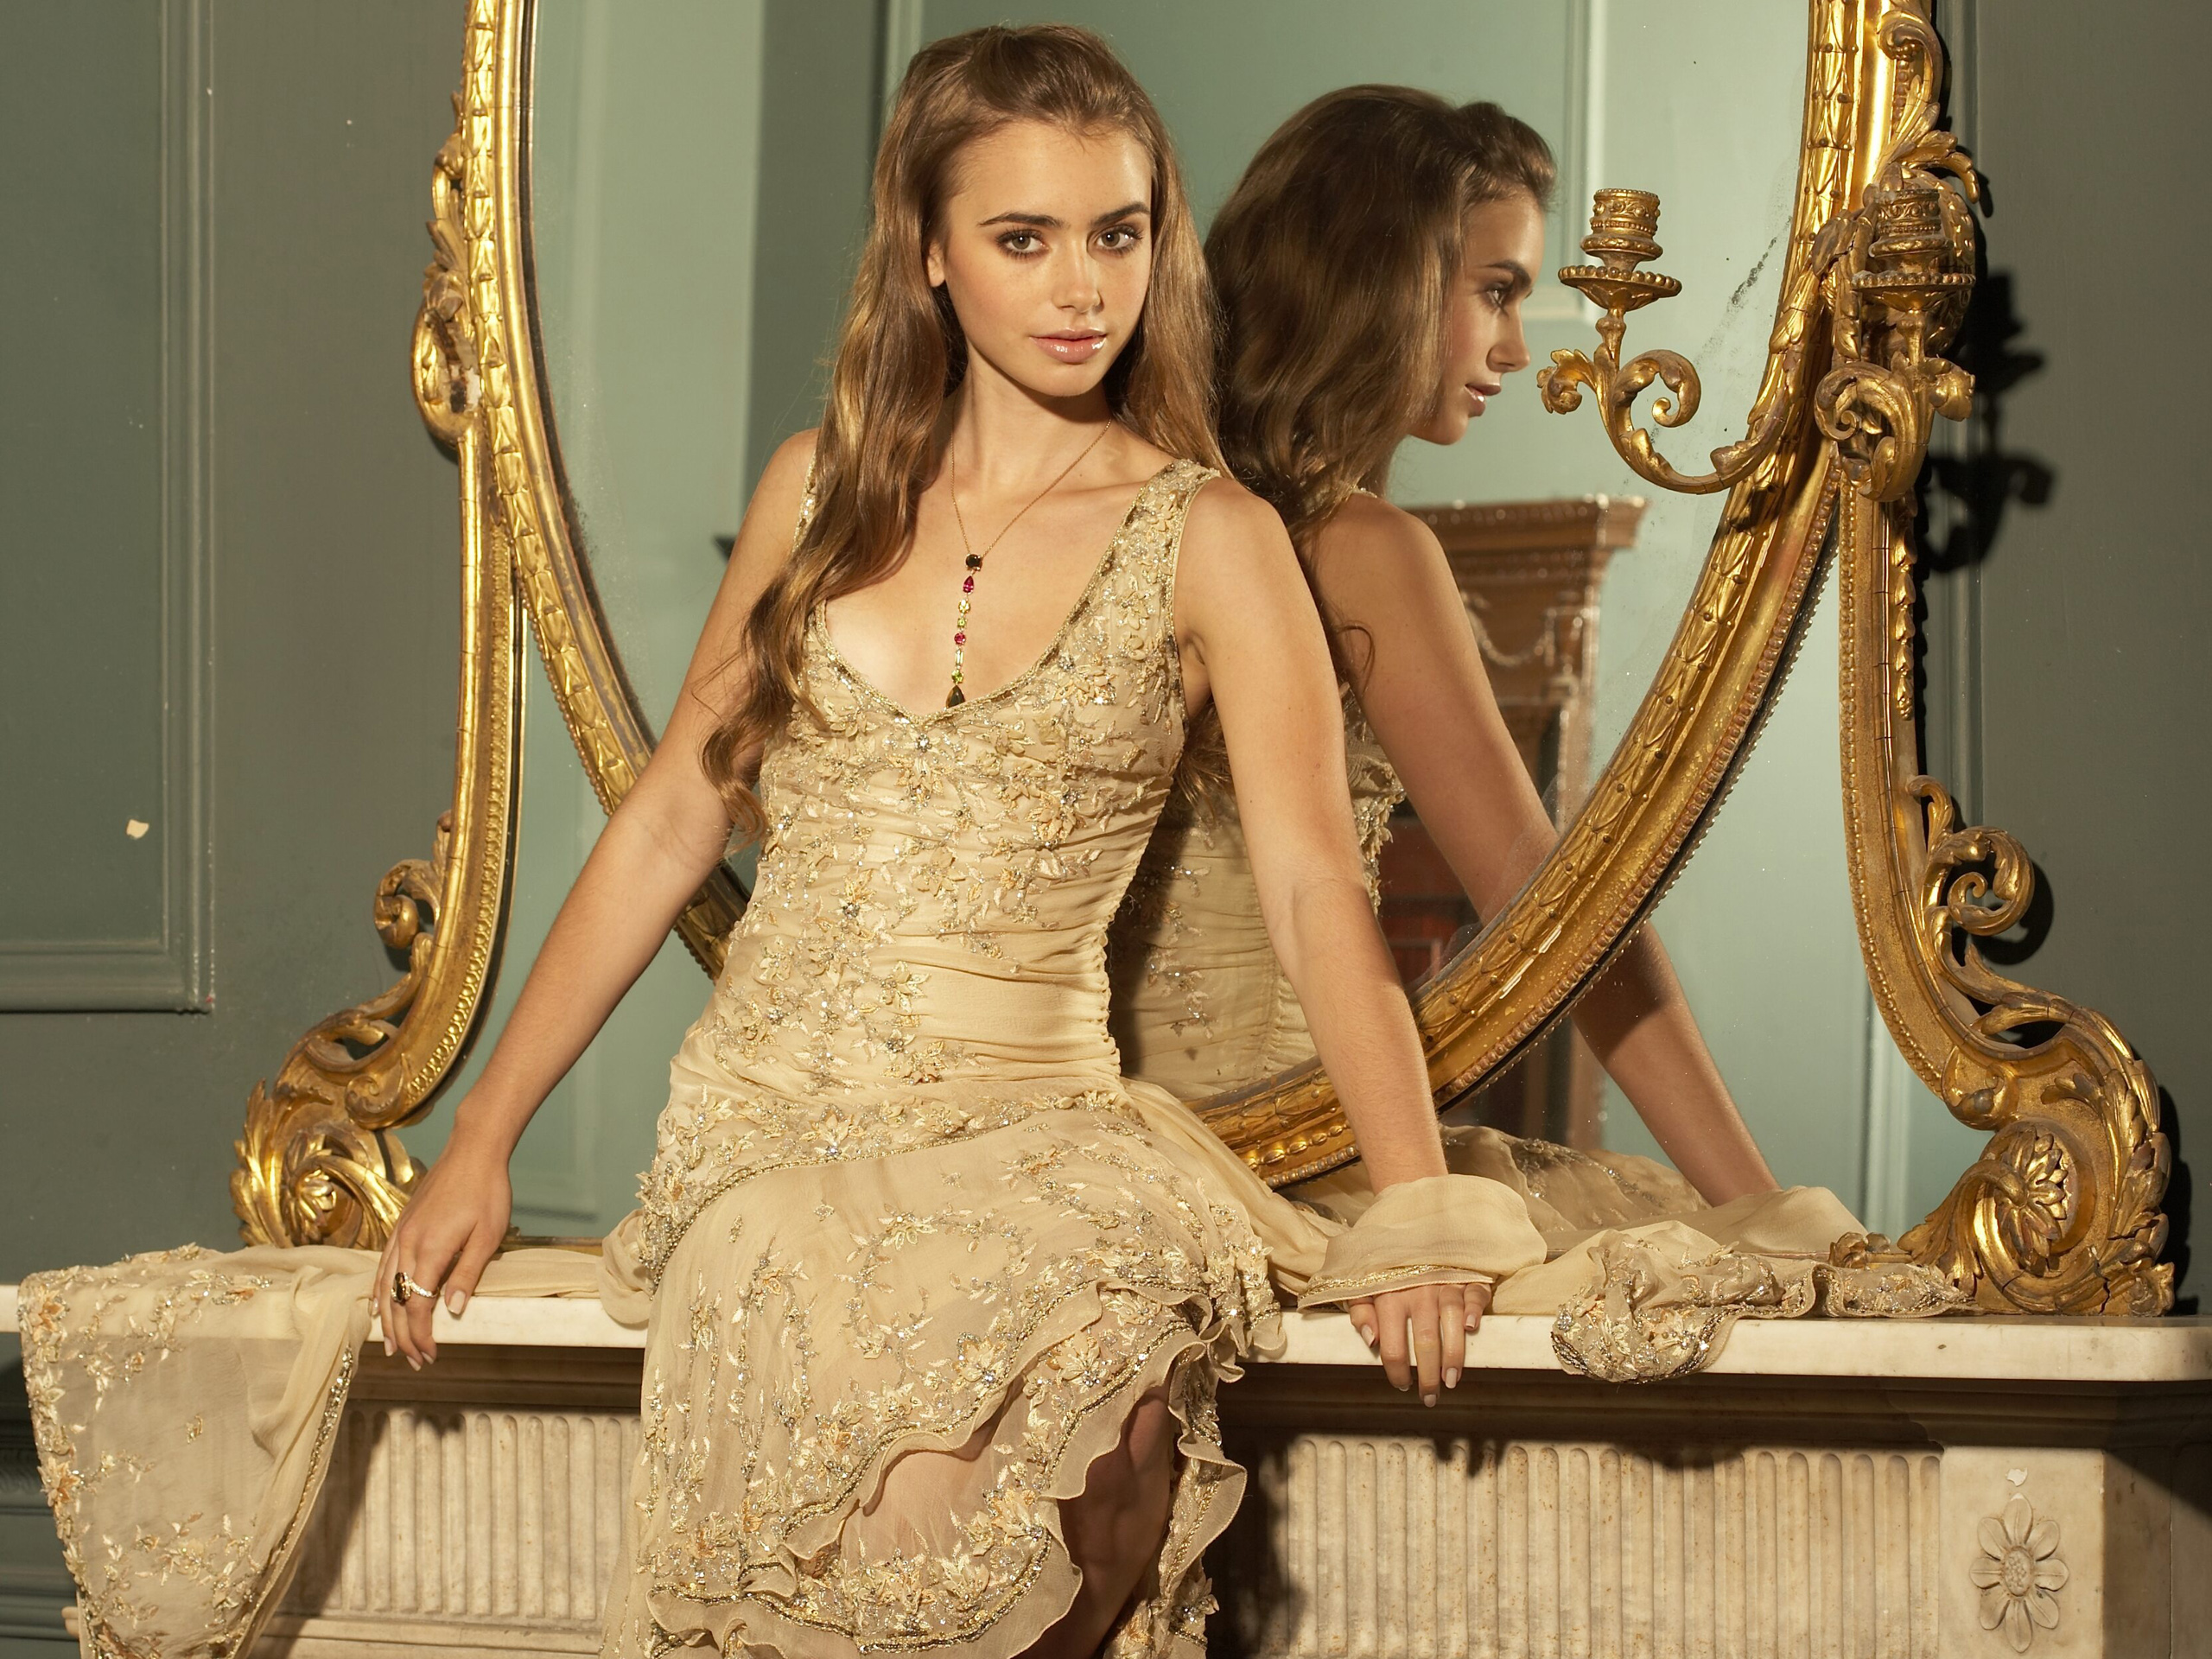 Фото девушек возле зеркала 13 фотография